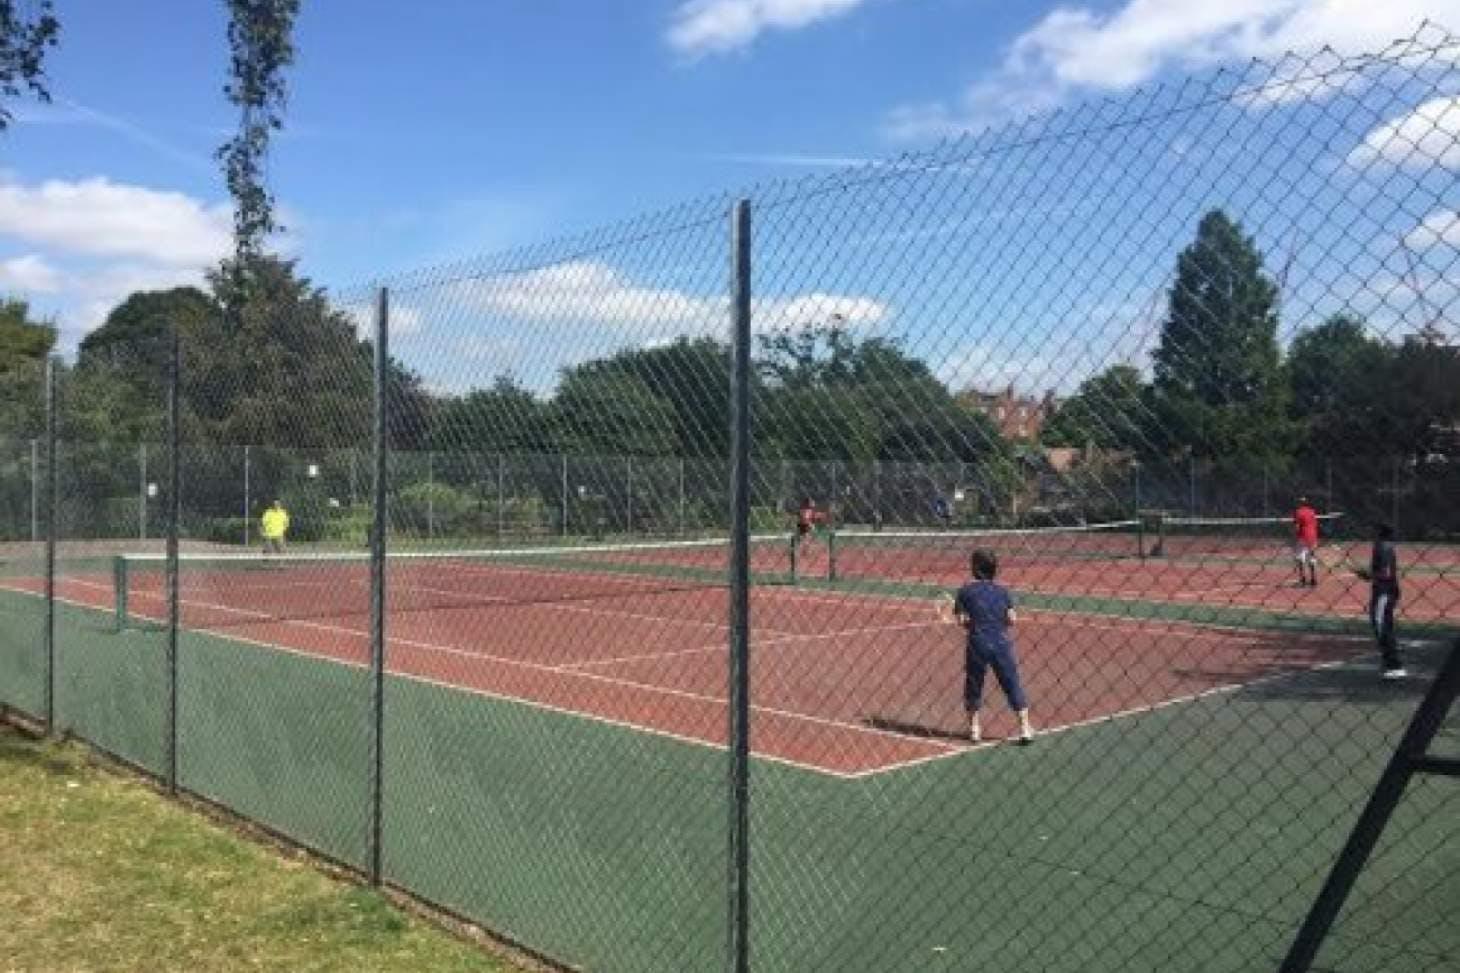 Kilburn Grange Outdoor | Hard (macadam) tennis court